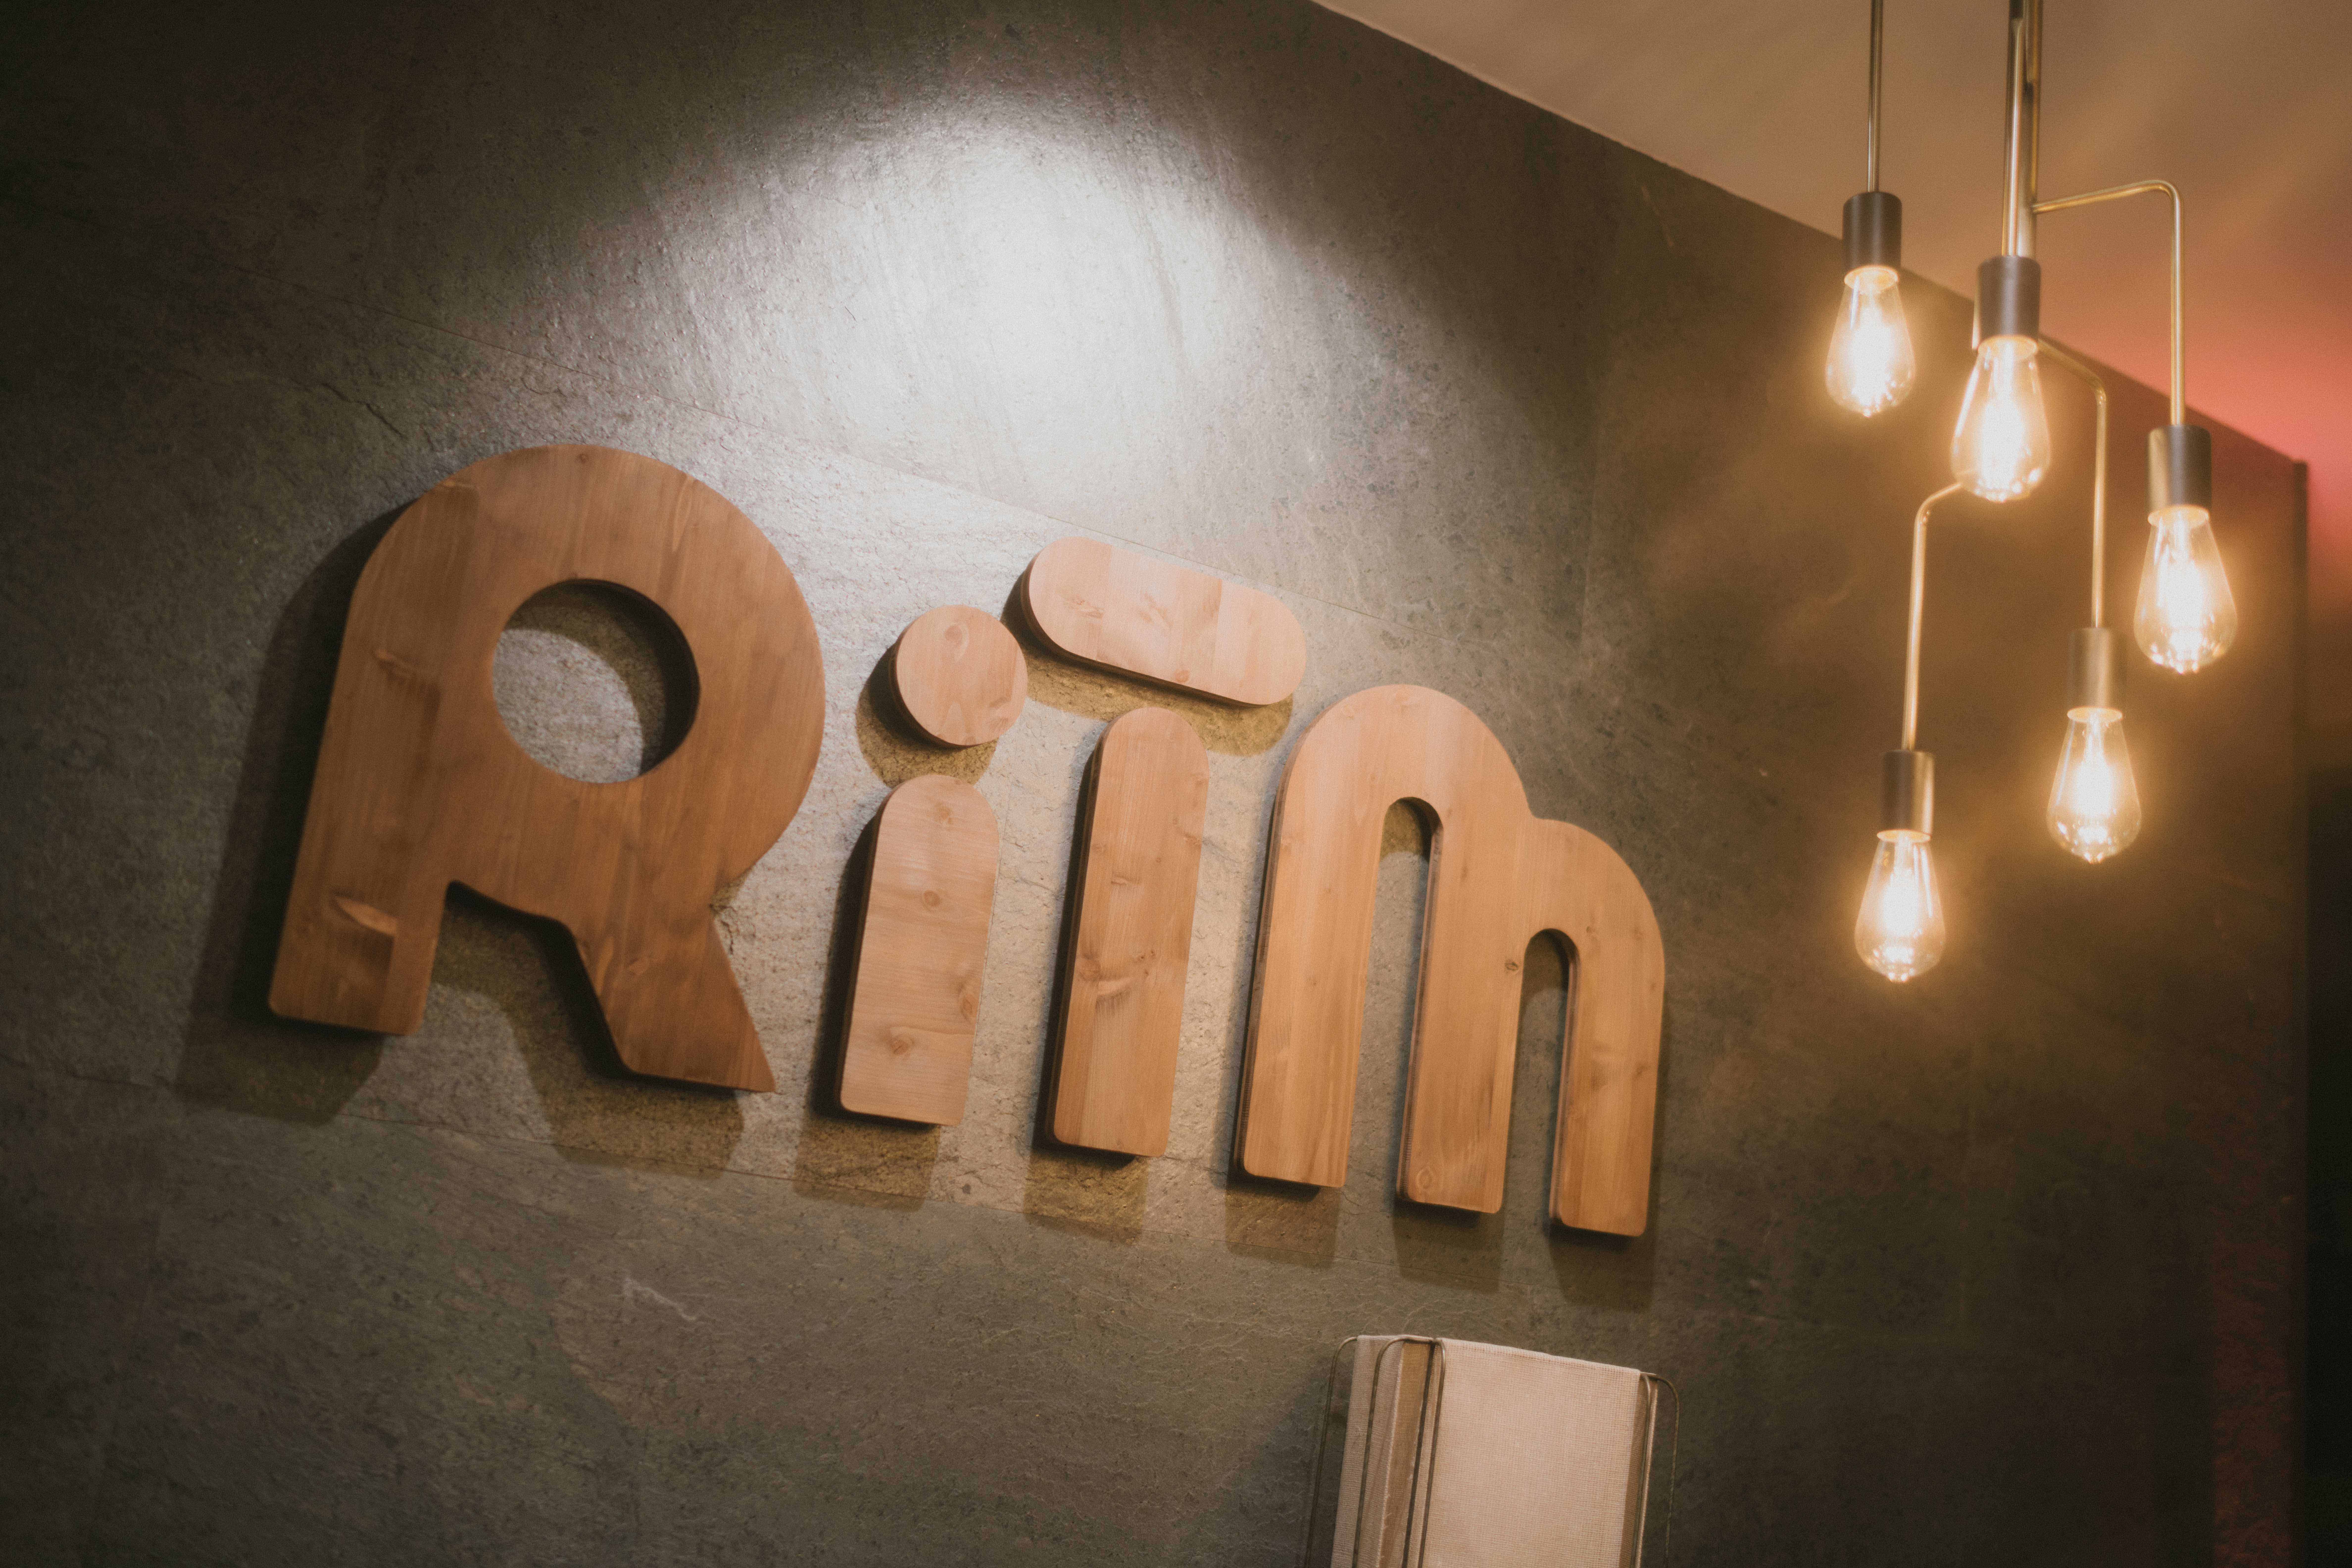 ritm-6-2-2020-pierremouton-saywho-07847